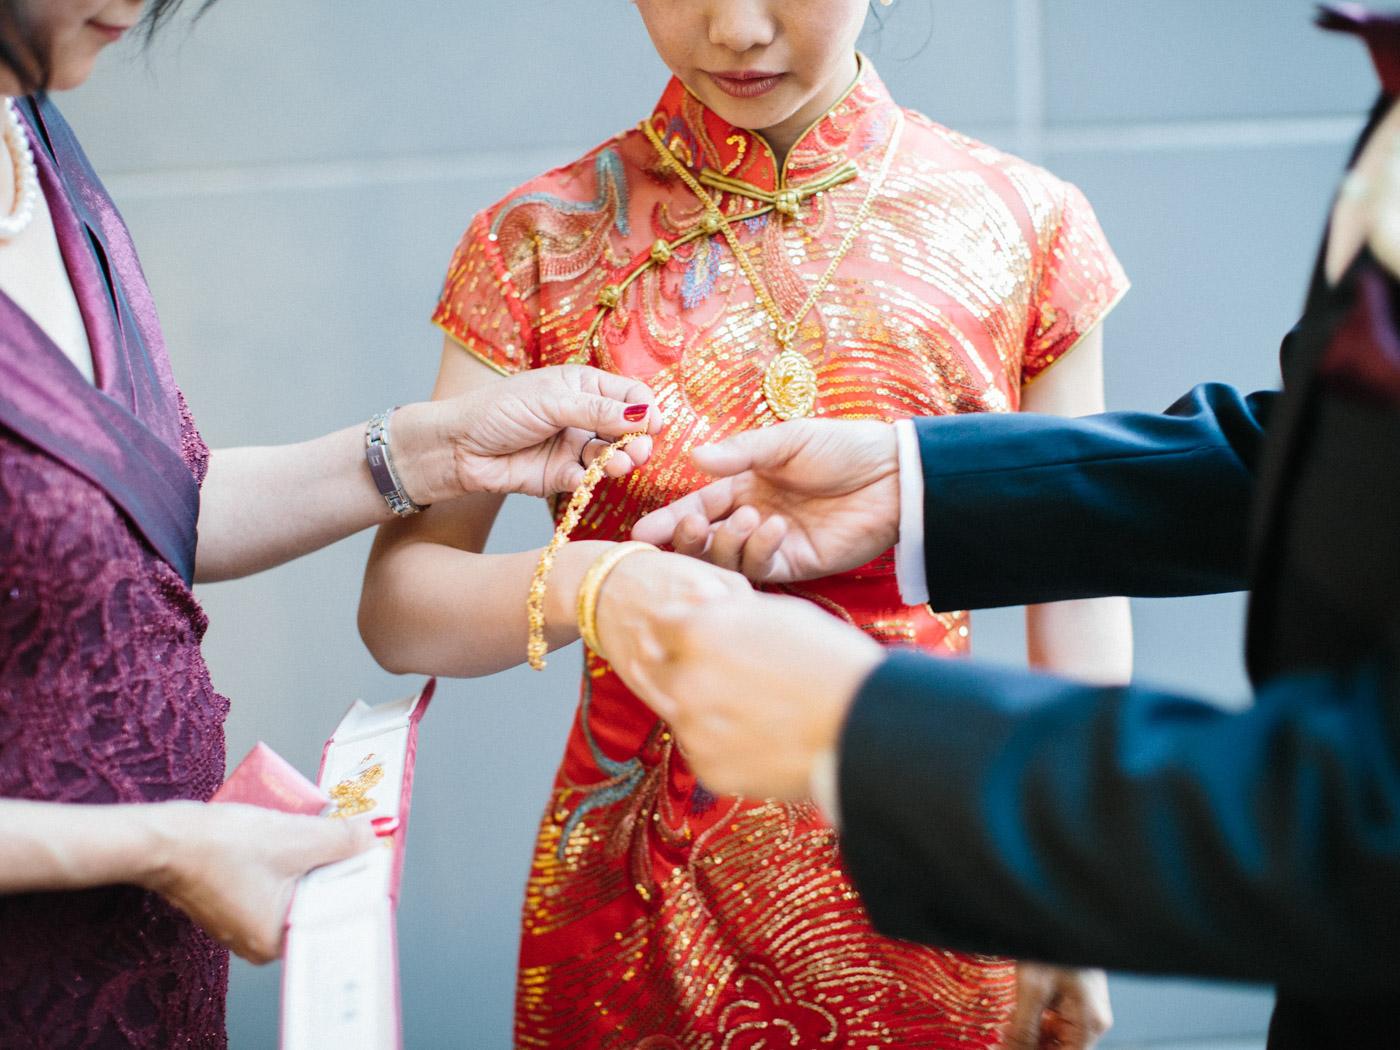 toronto_wedding_photographer_fine_art_documentary_photography-95.jpg